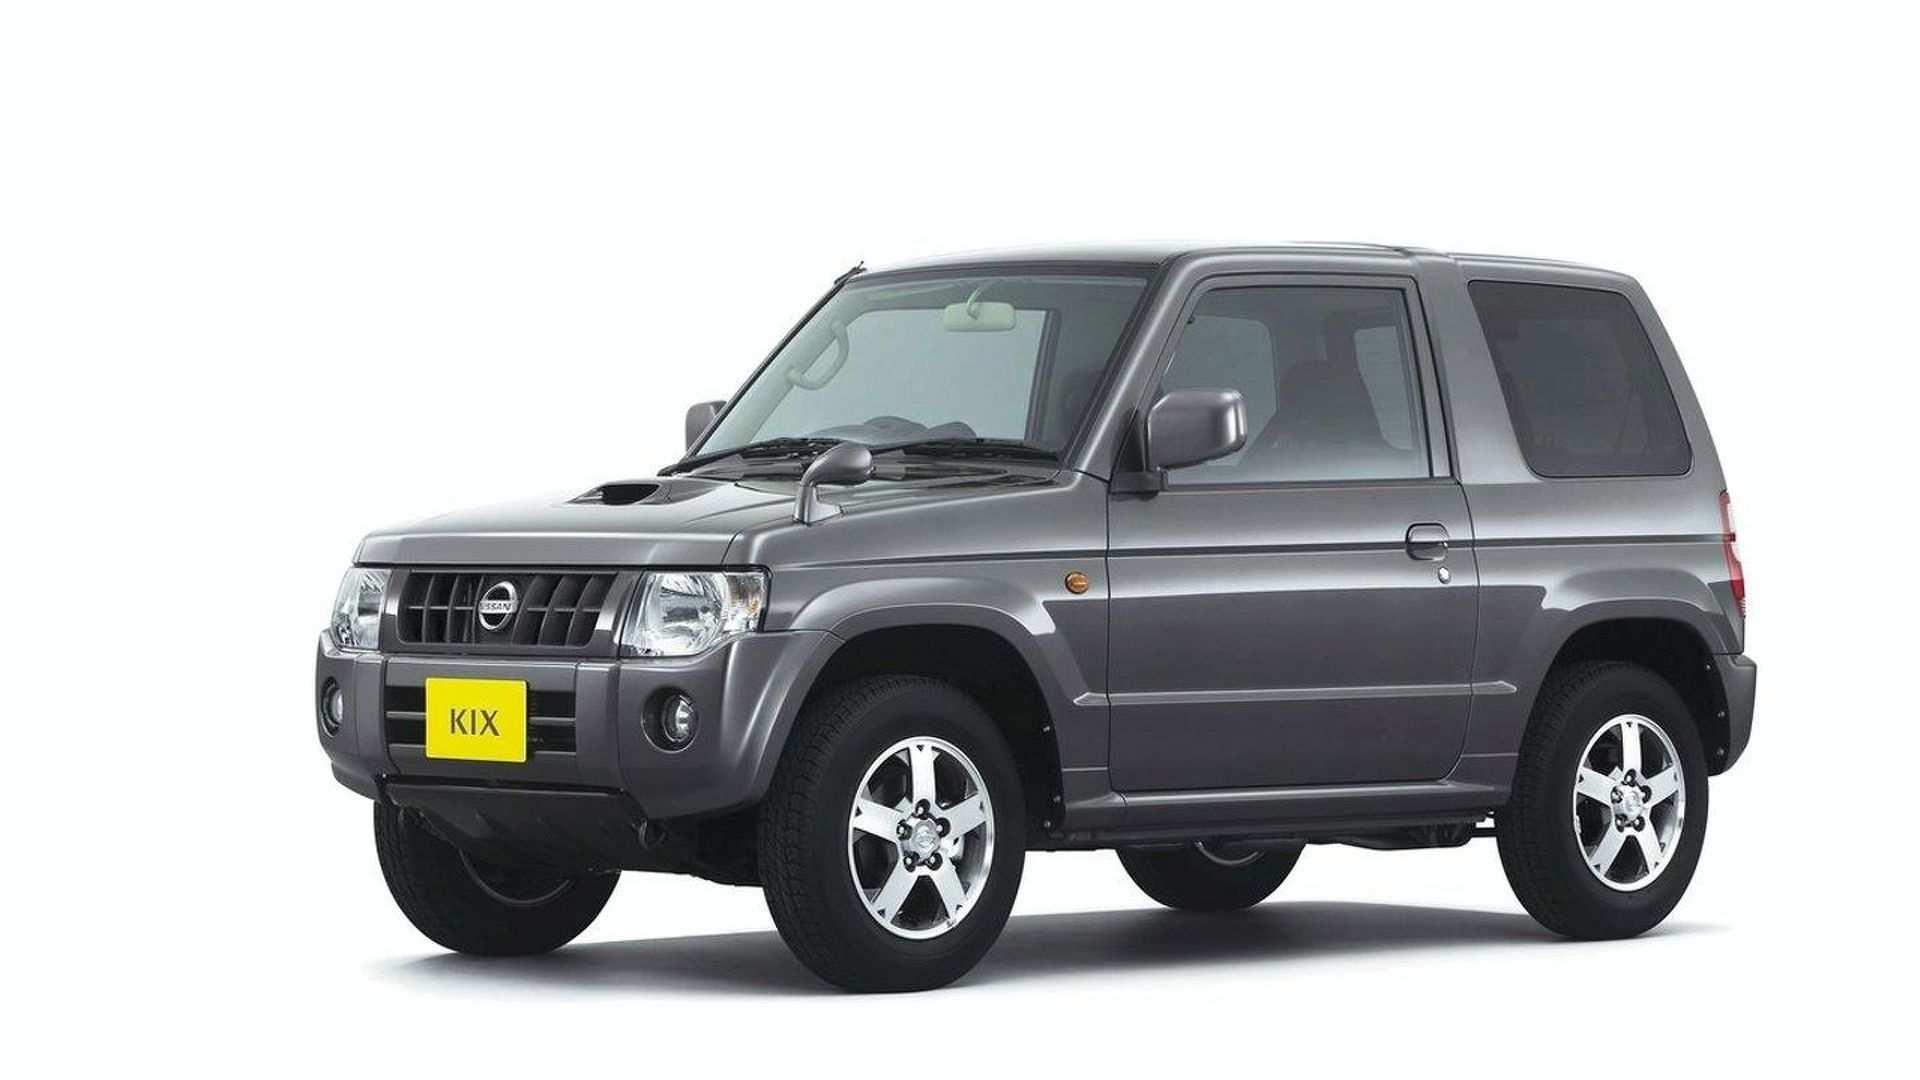 48 Best Review Nissan Kix 2020 New Concept with Nissan Kix 2020